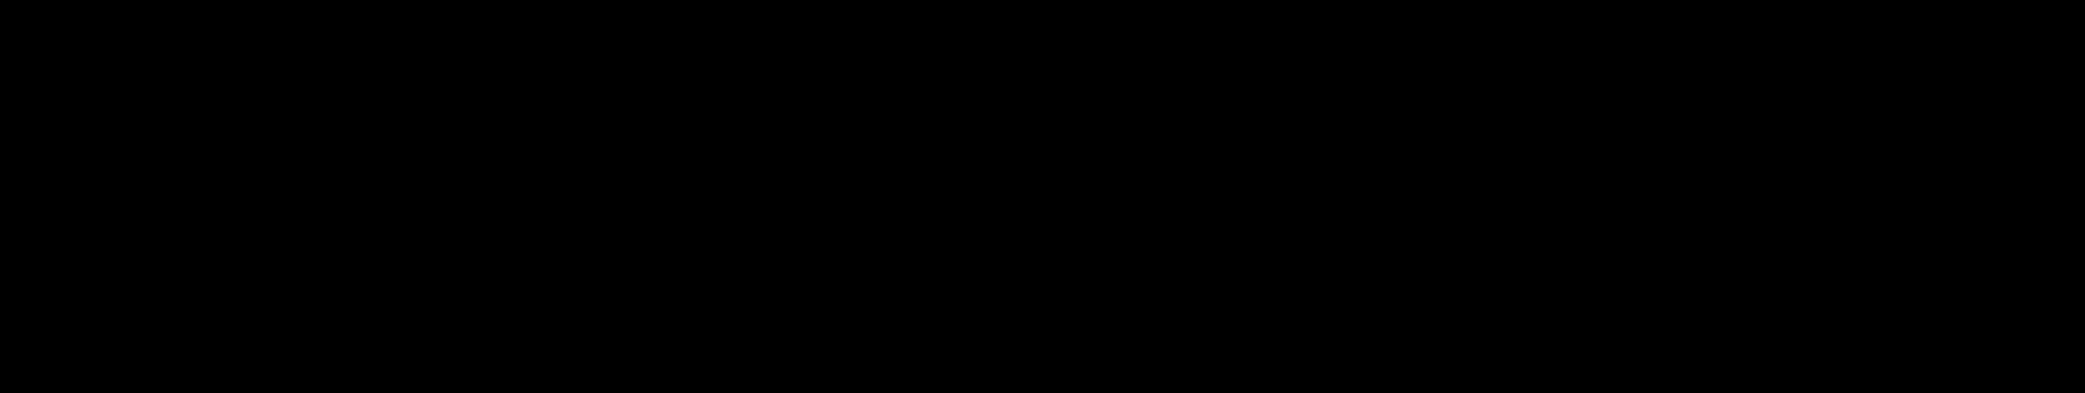 mazurenko-01